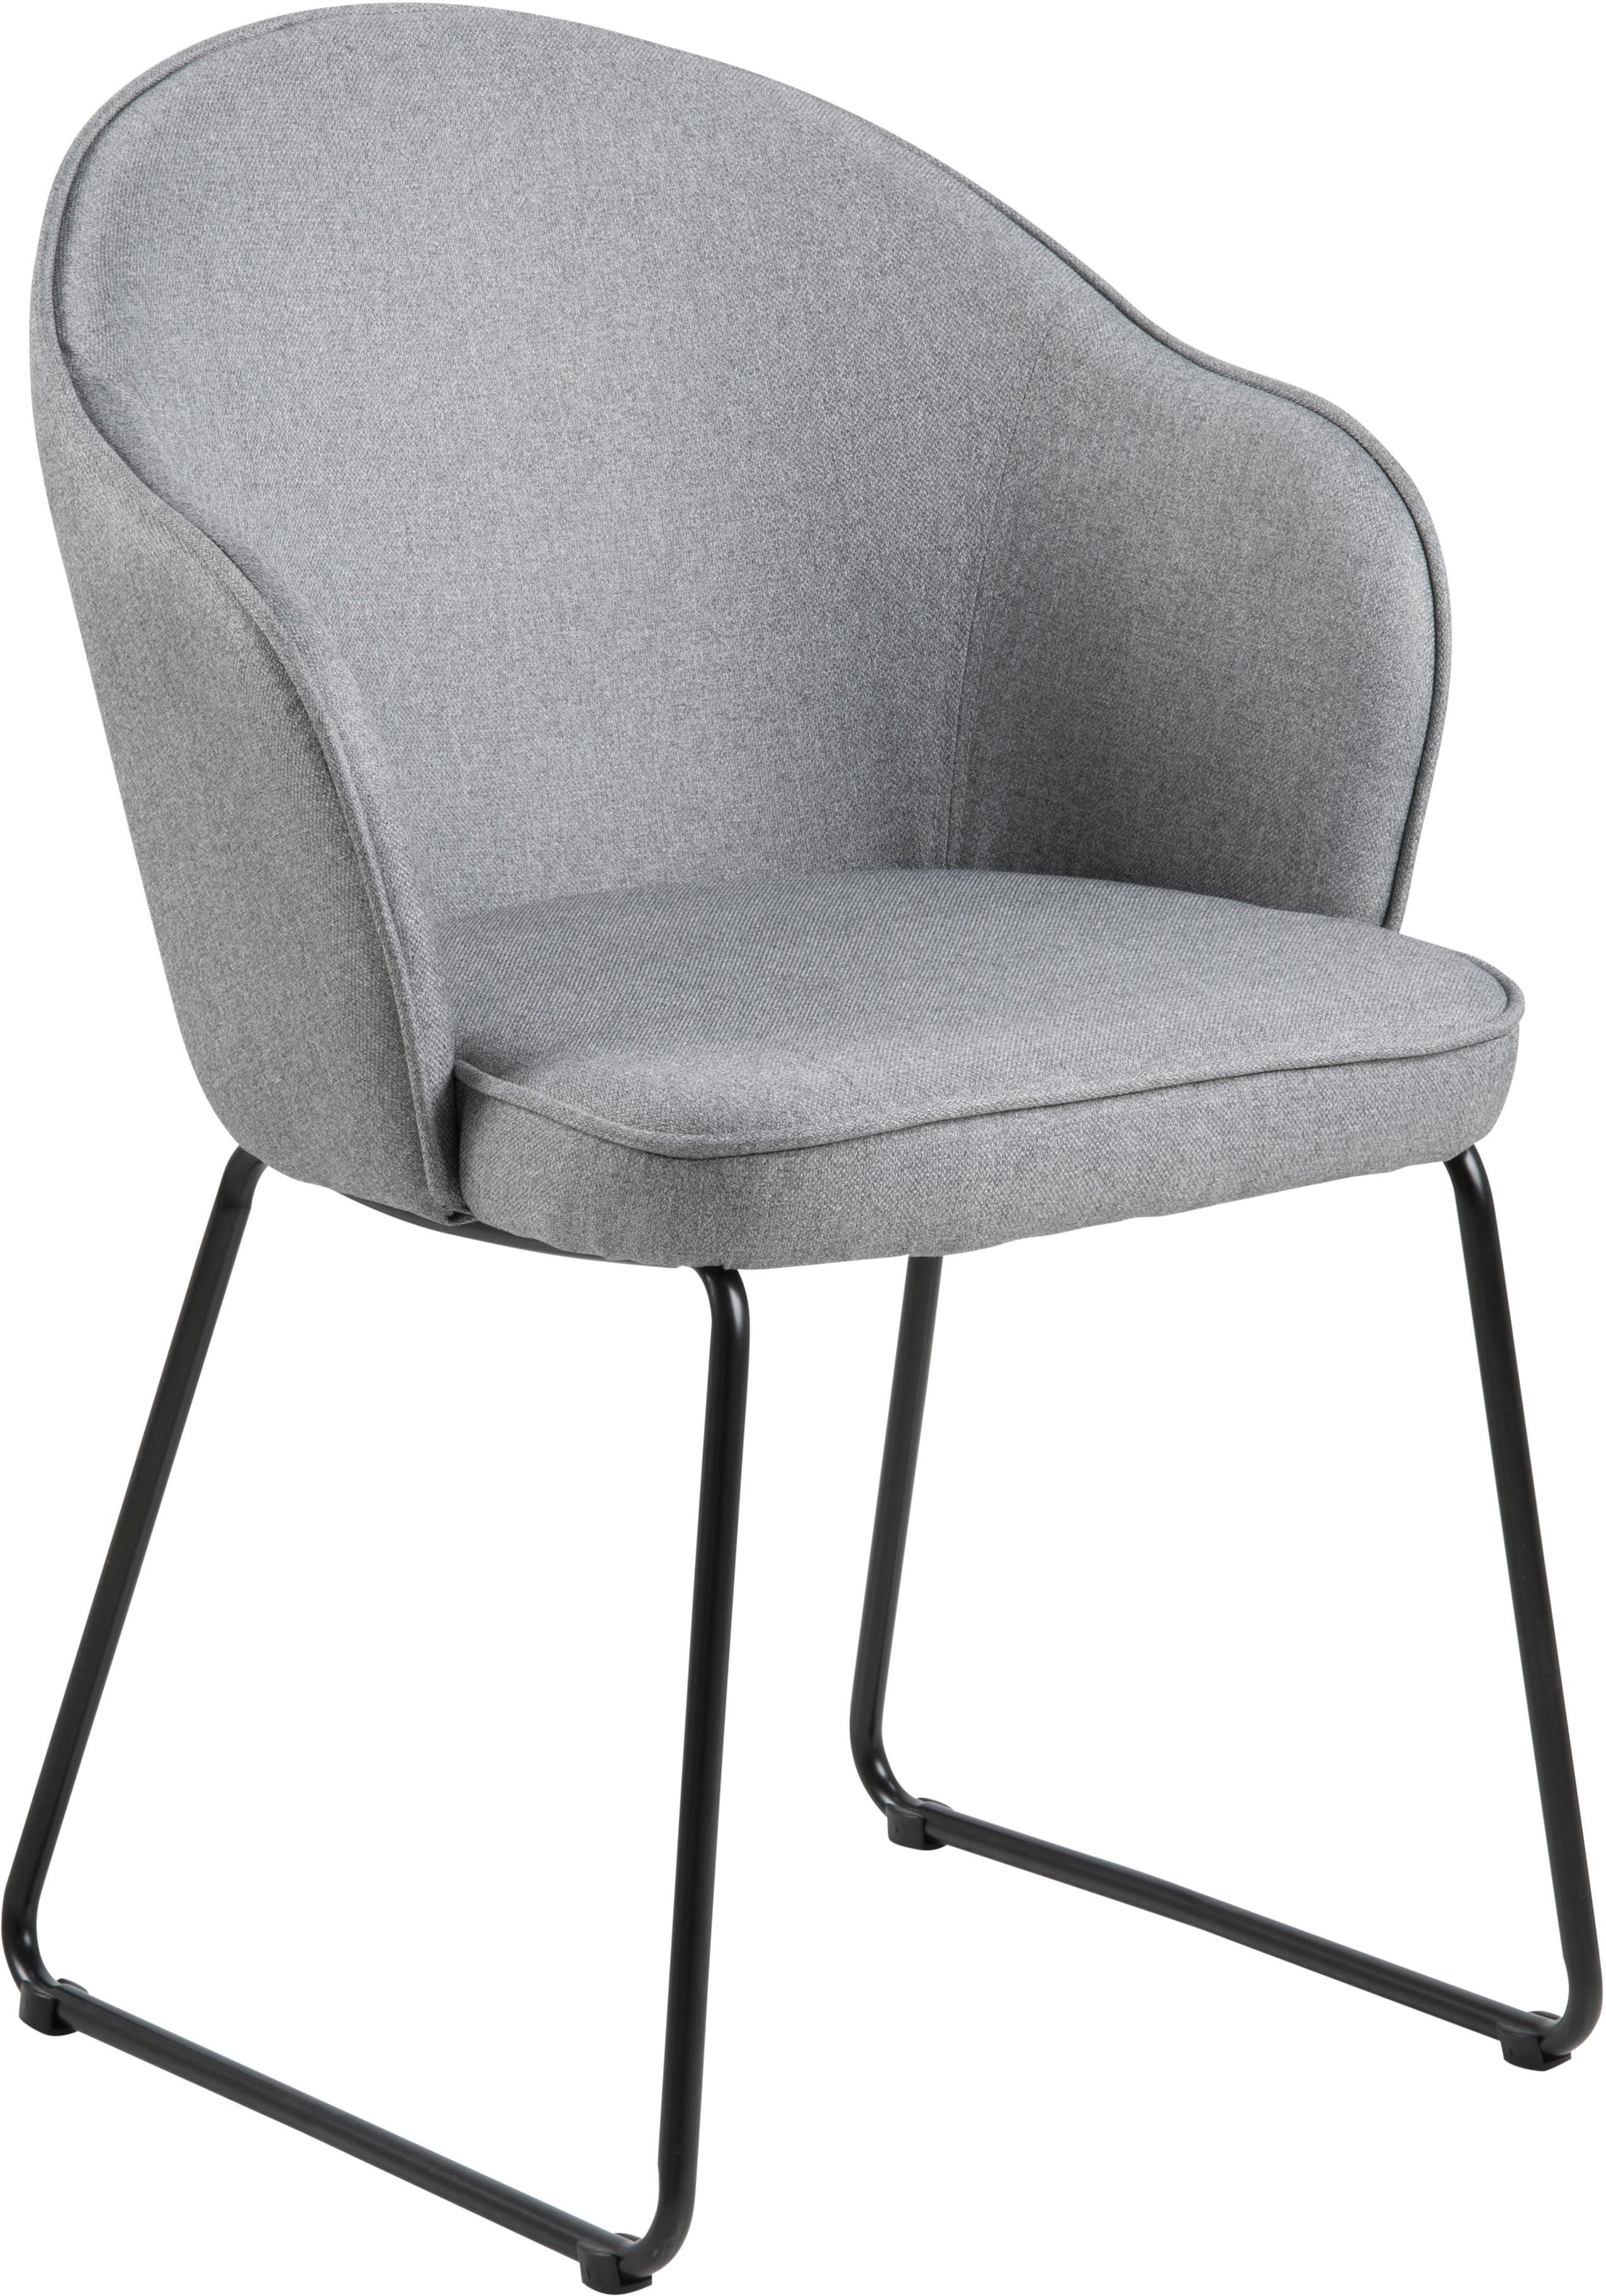 Armstoel Mitzie, Bekleding: polyester, Poten: gelakt metaal, Lichtgrijs, zwart, B 57 x D 59 cm